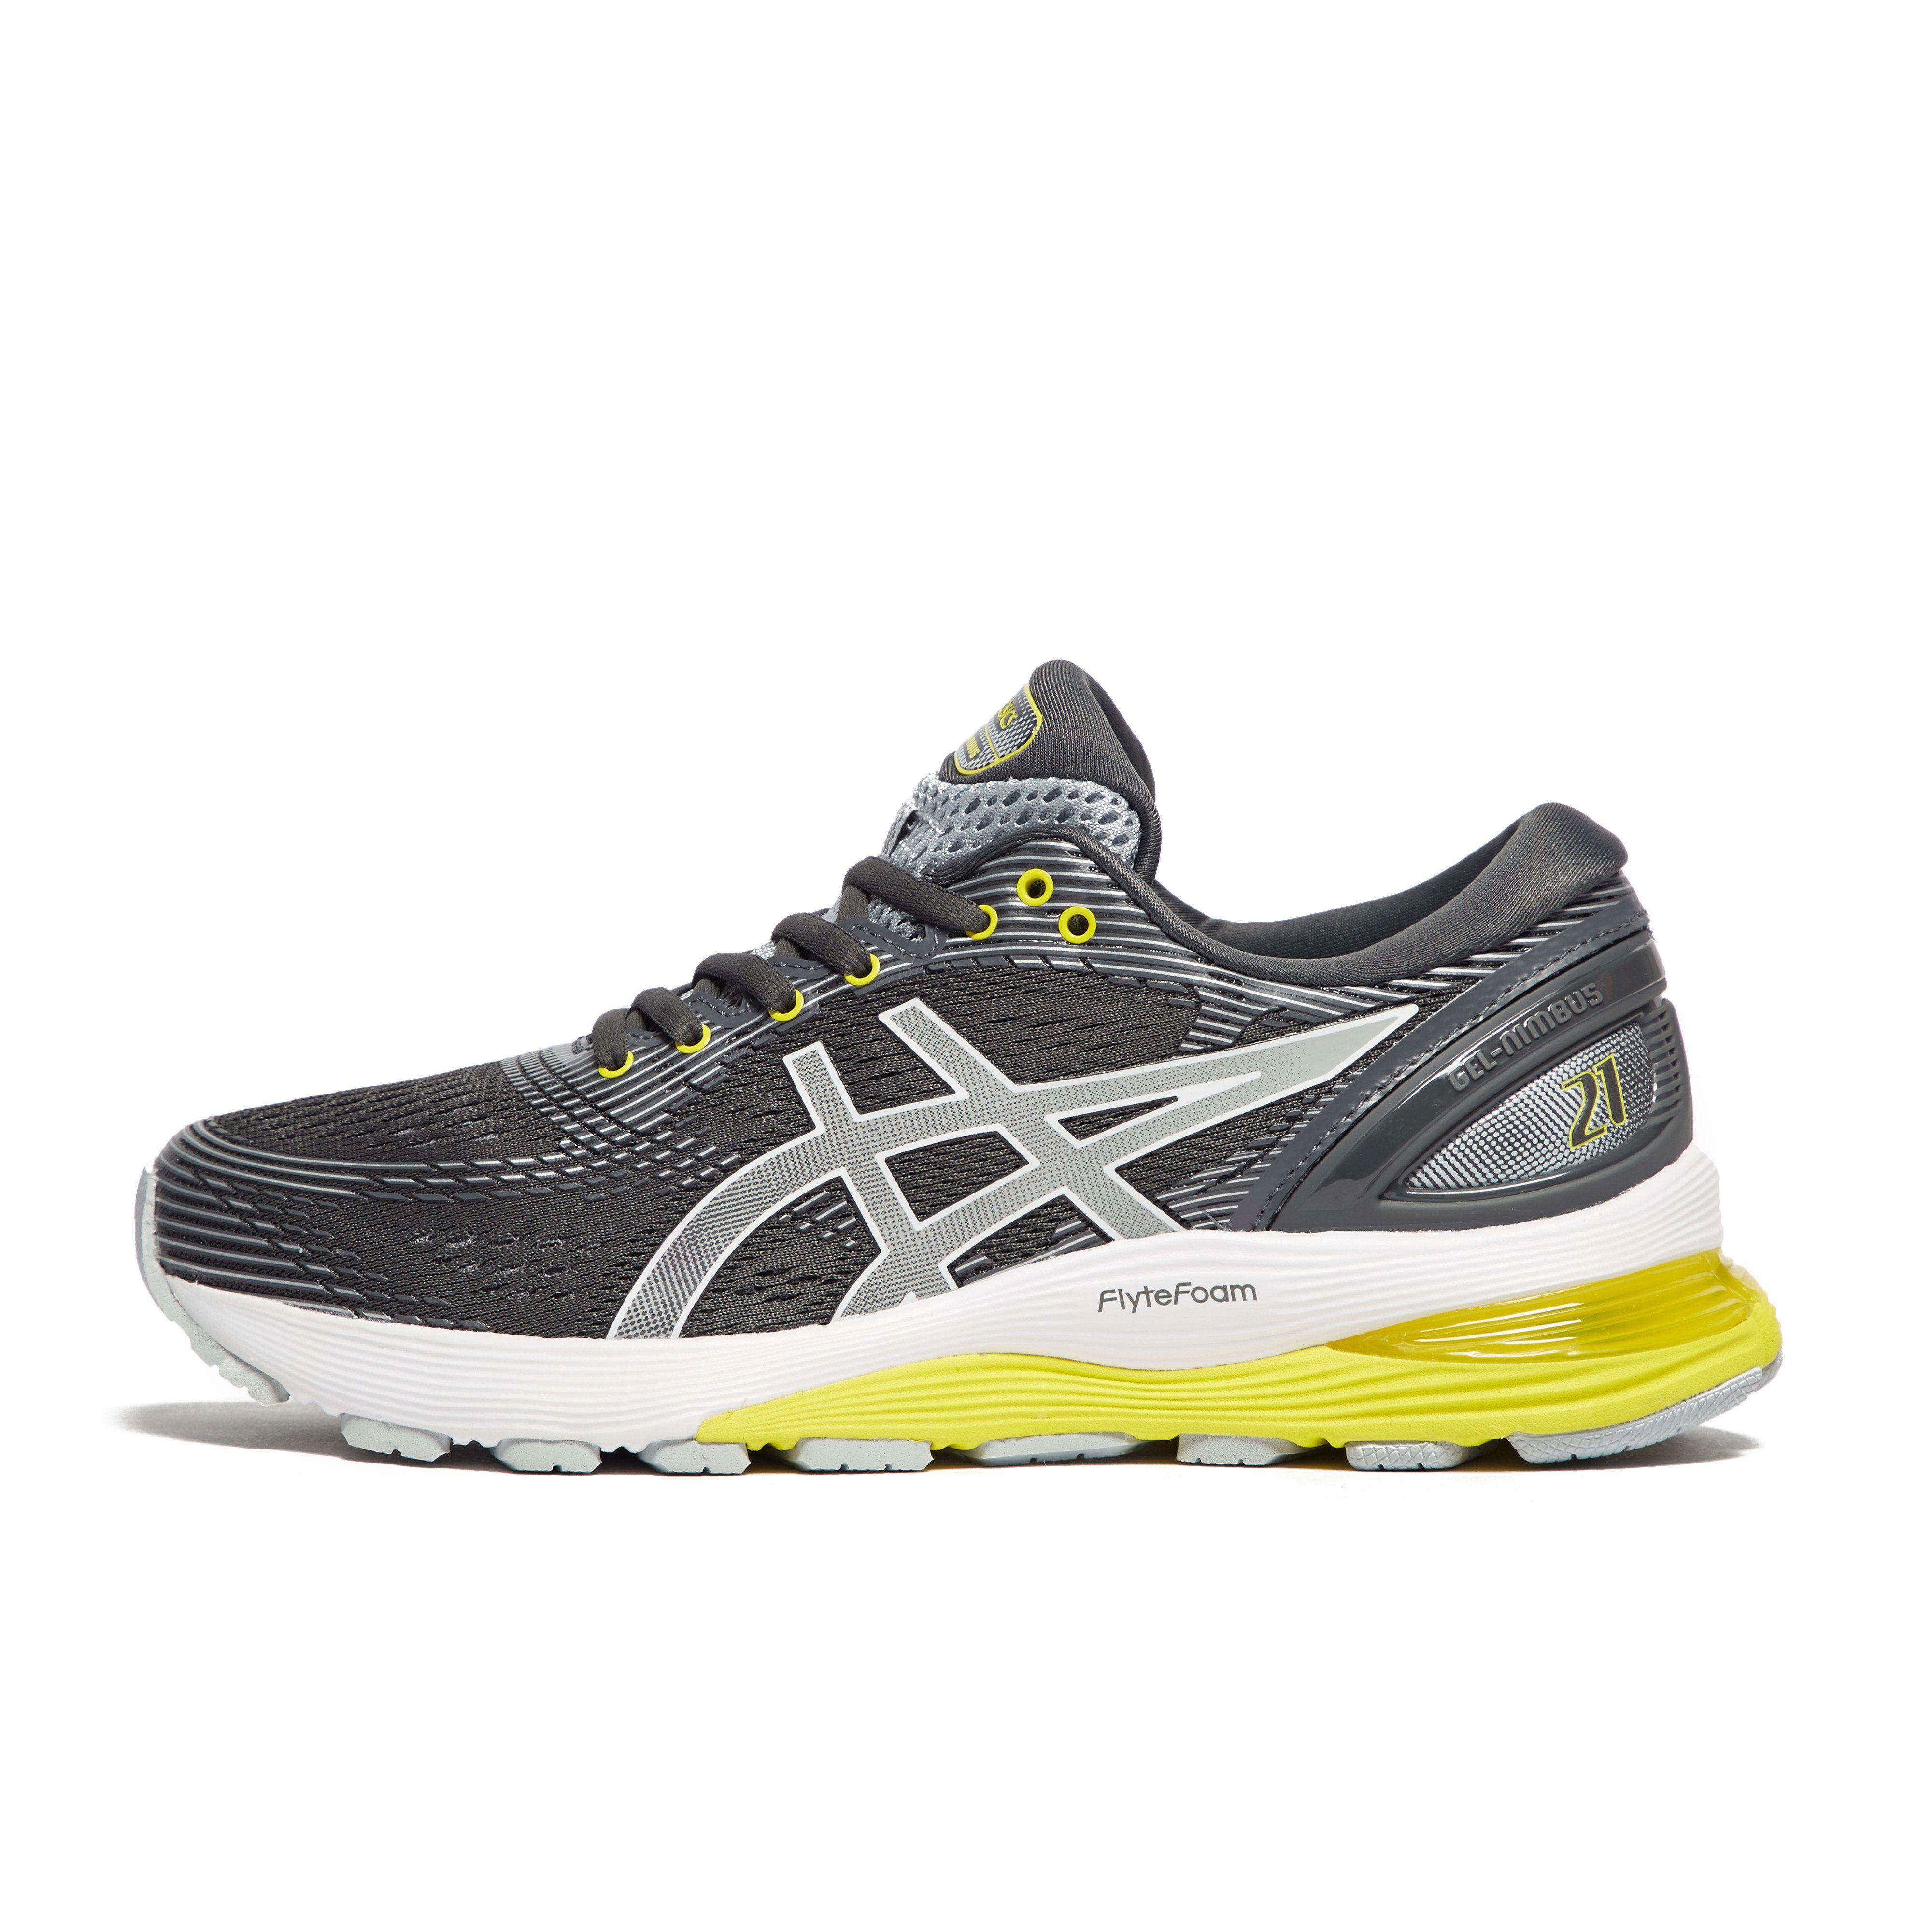 ASICS Gel-Nimbus 21 Women's Running Shoes